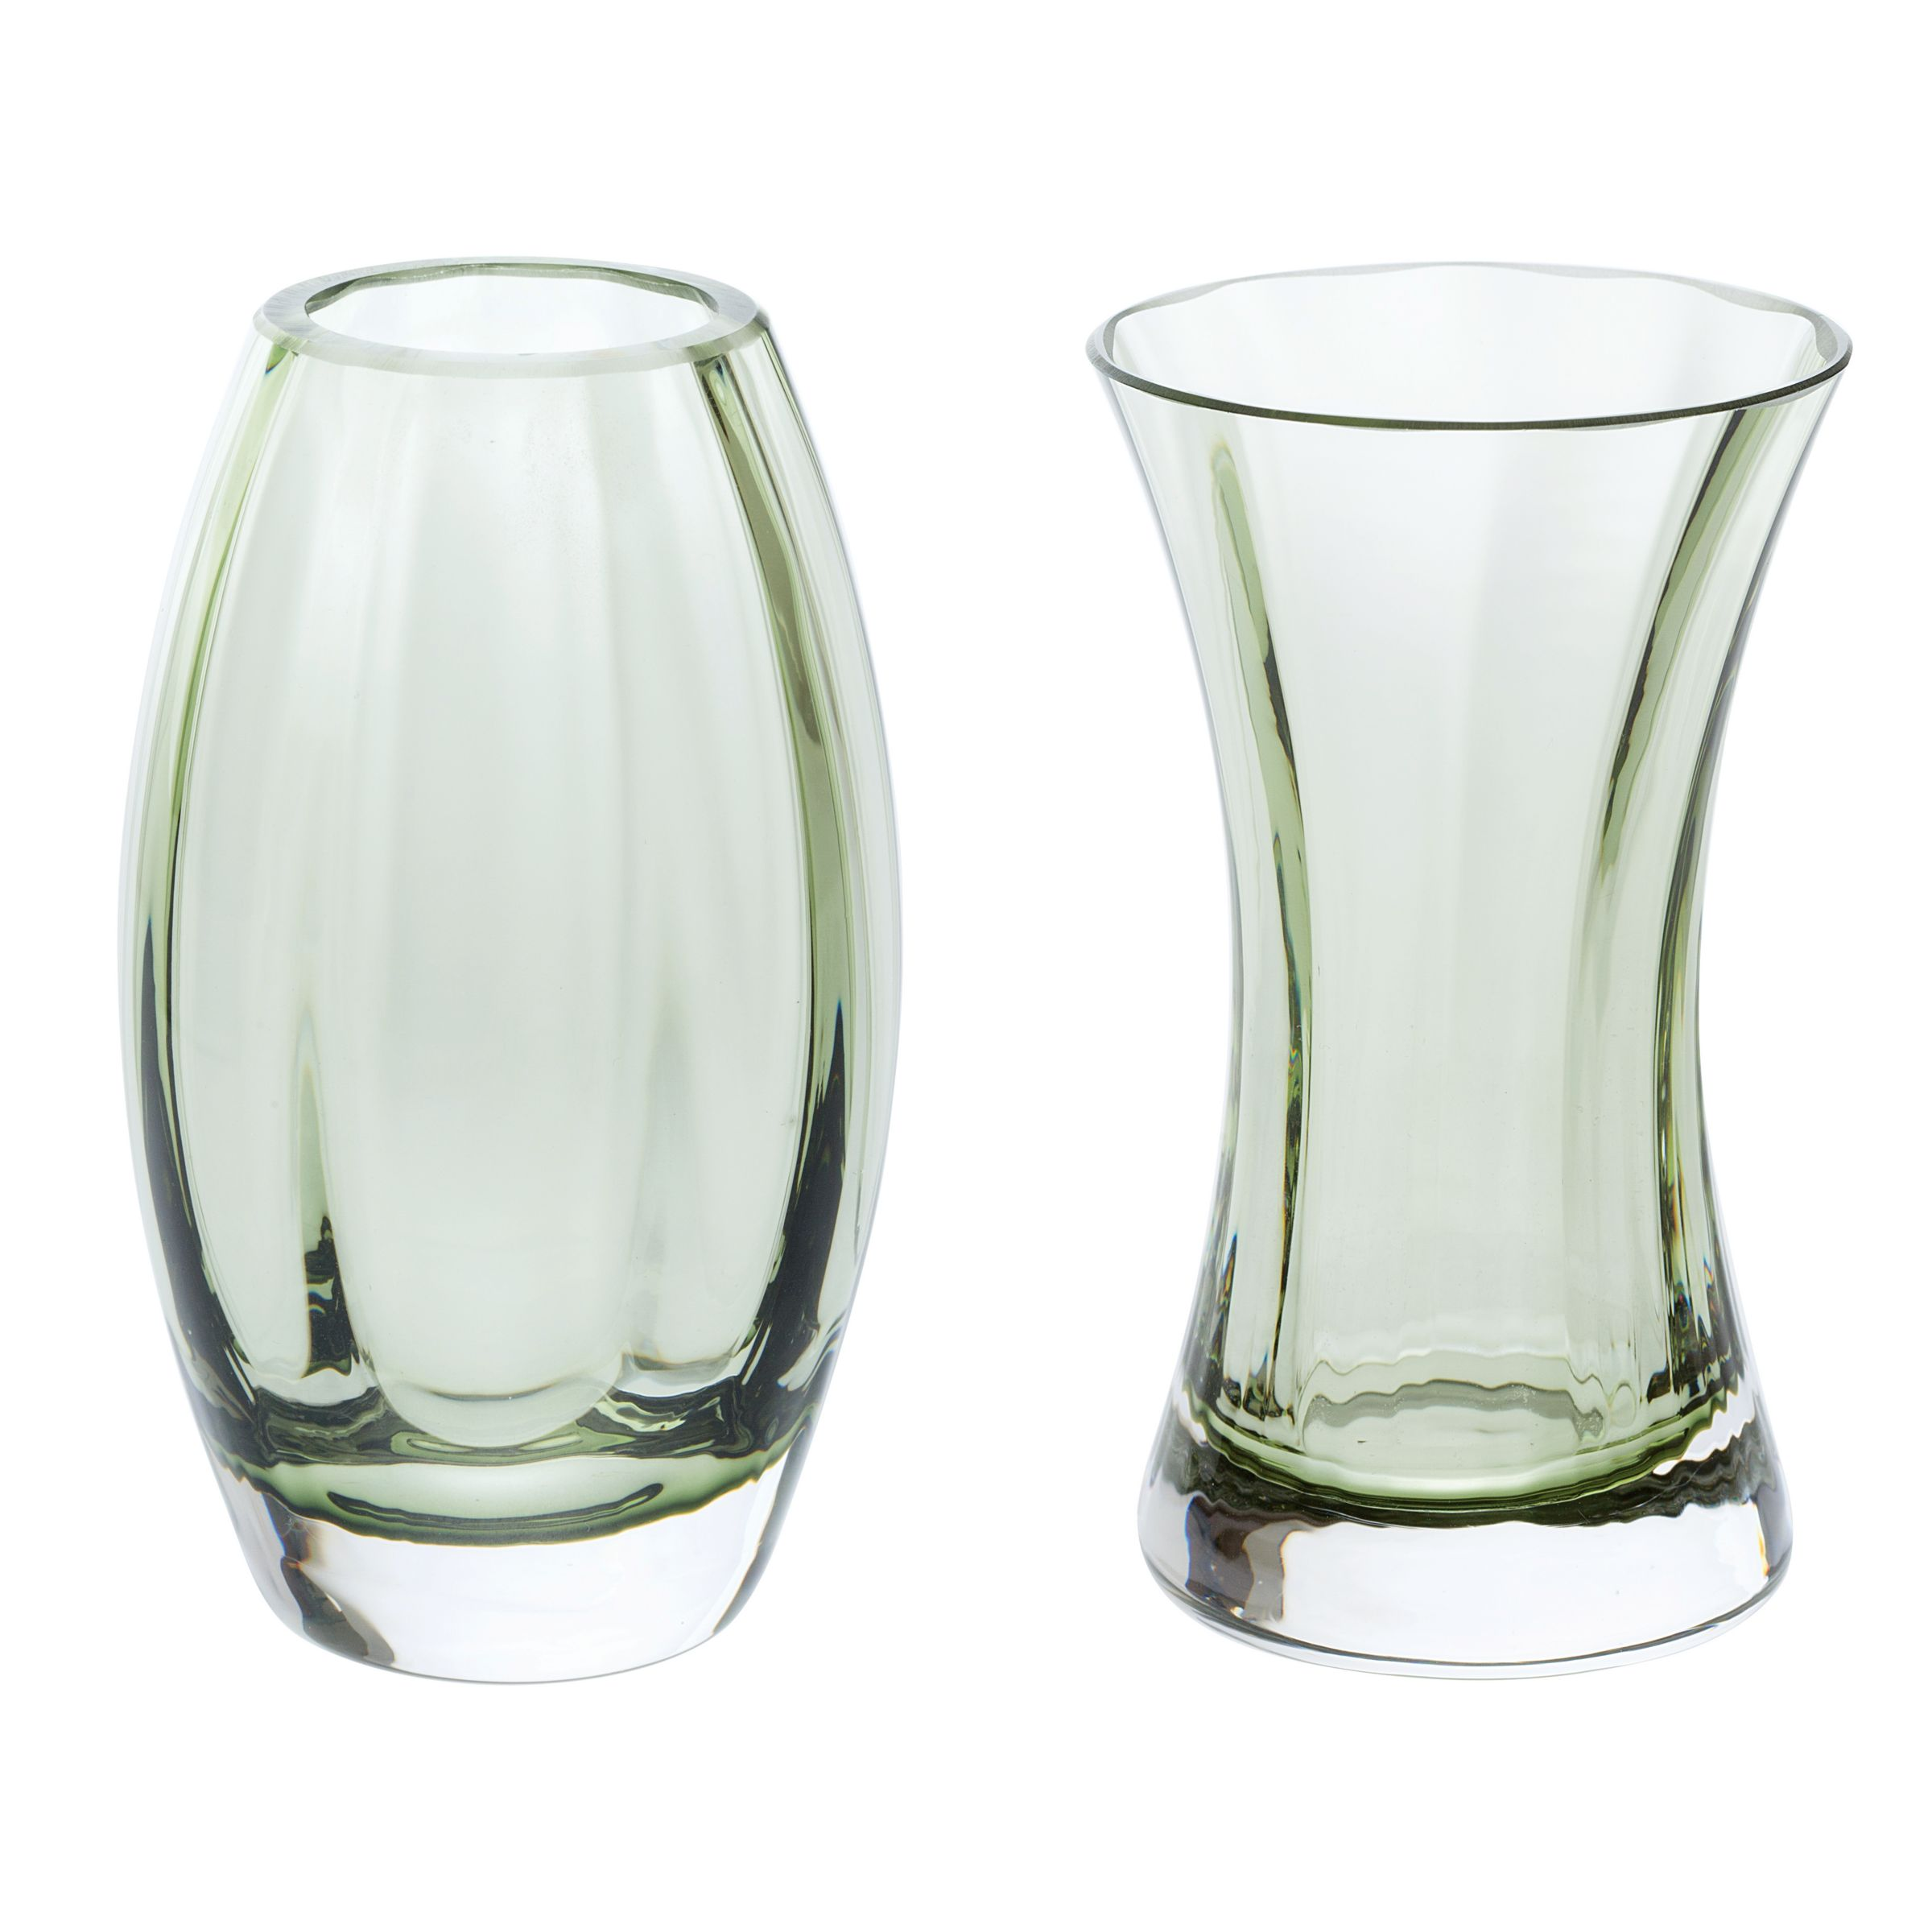 Dartington Crystal Dartington Crystal 'Adam & Eve' Vases, Gift Pack, Set of 2